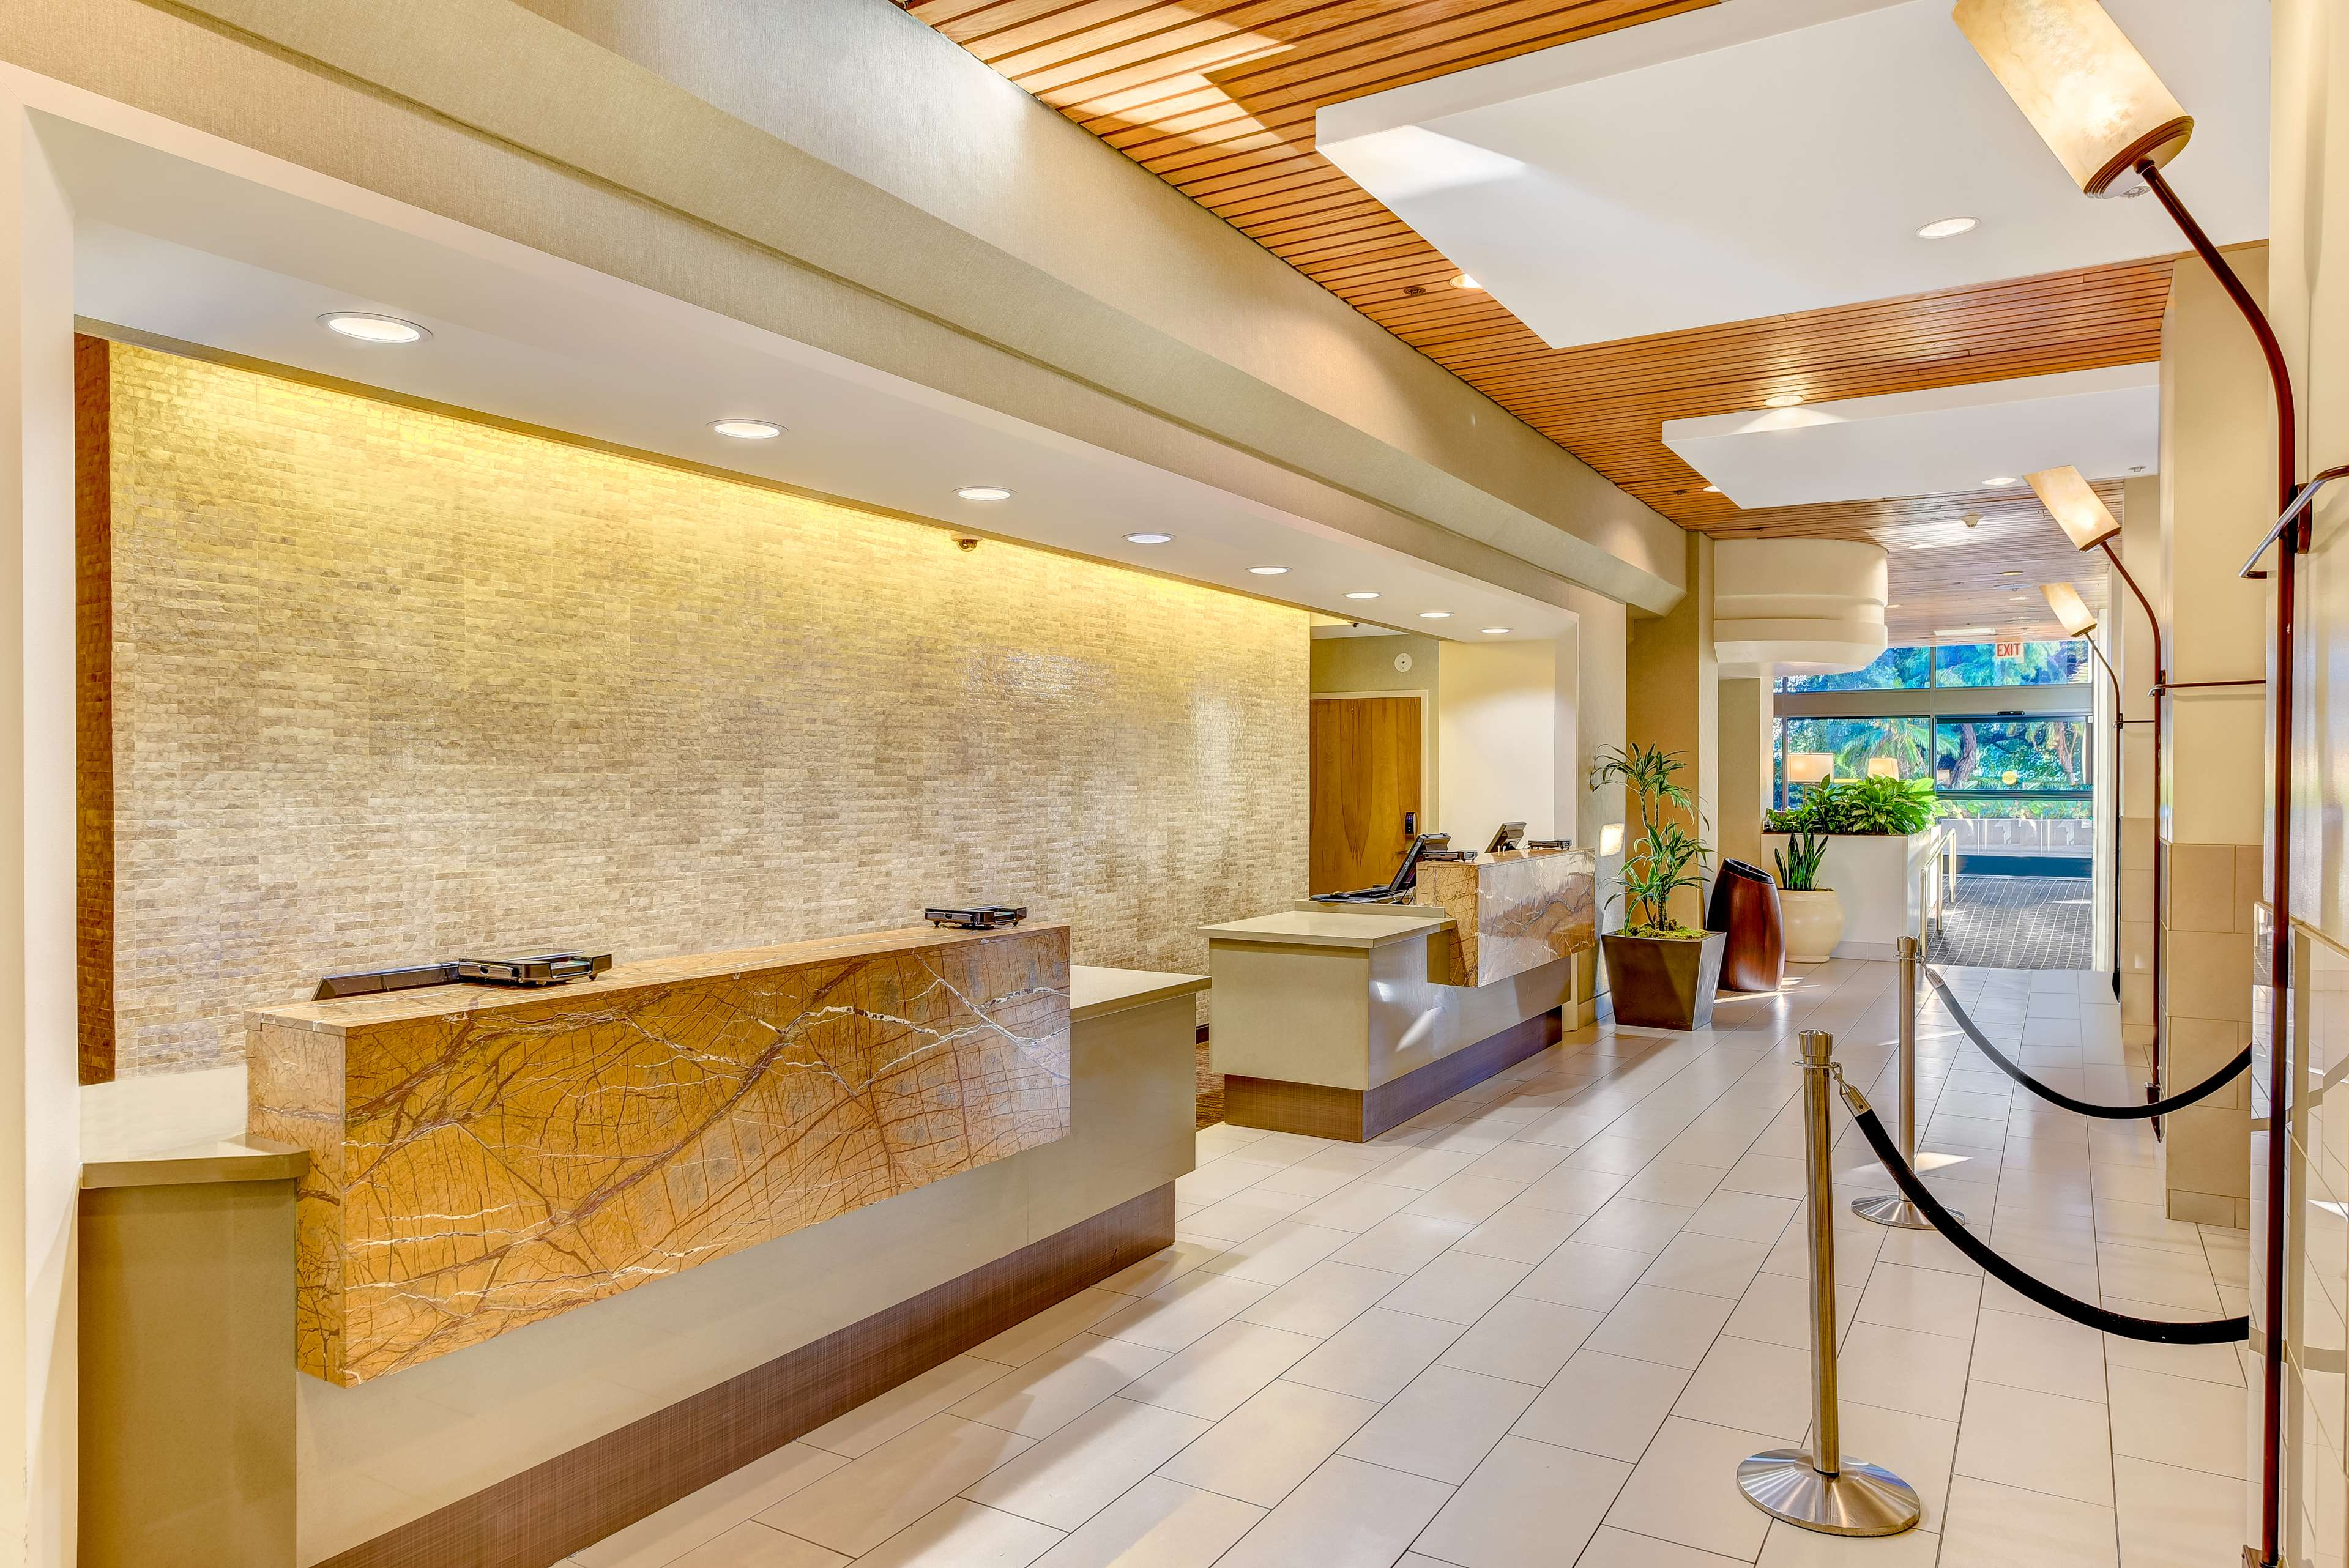 DoubleTree by Hilton Hotel Anaheim - Orange County image 13